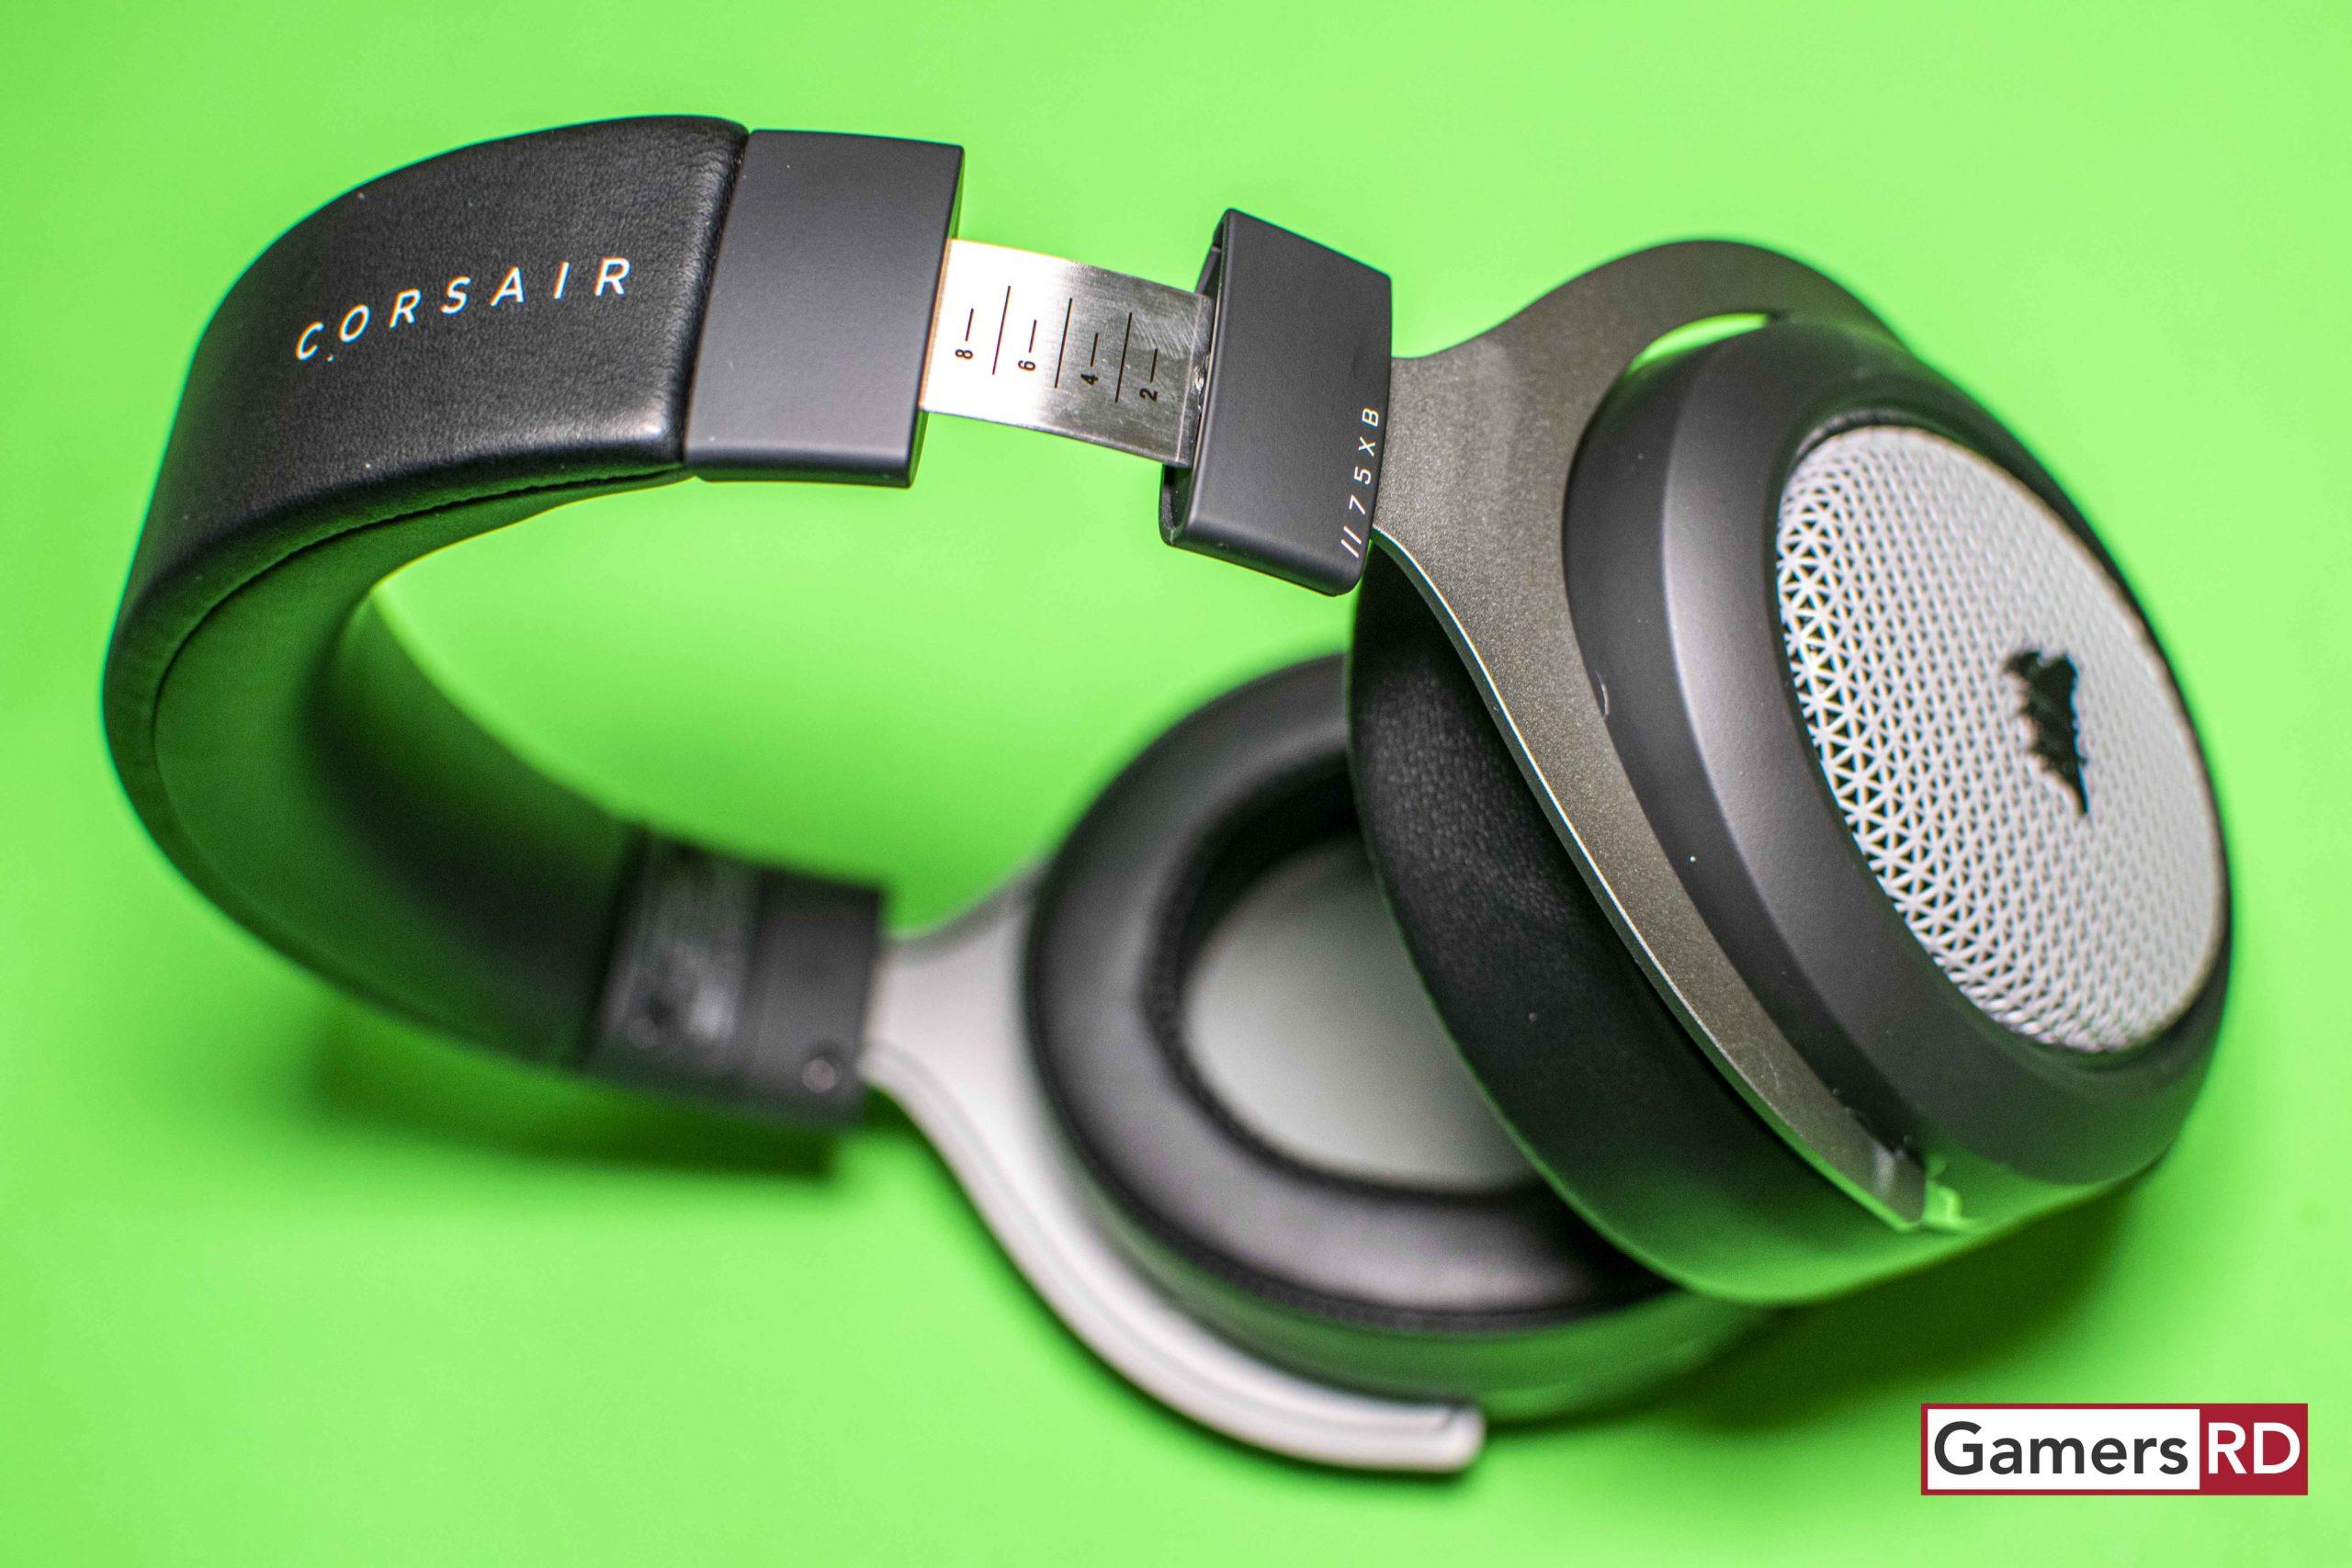 CORSAIR HS 75 XB Headset review, 3 GamersRD